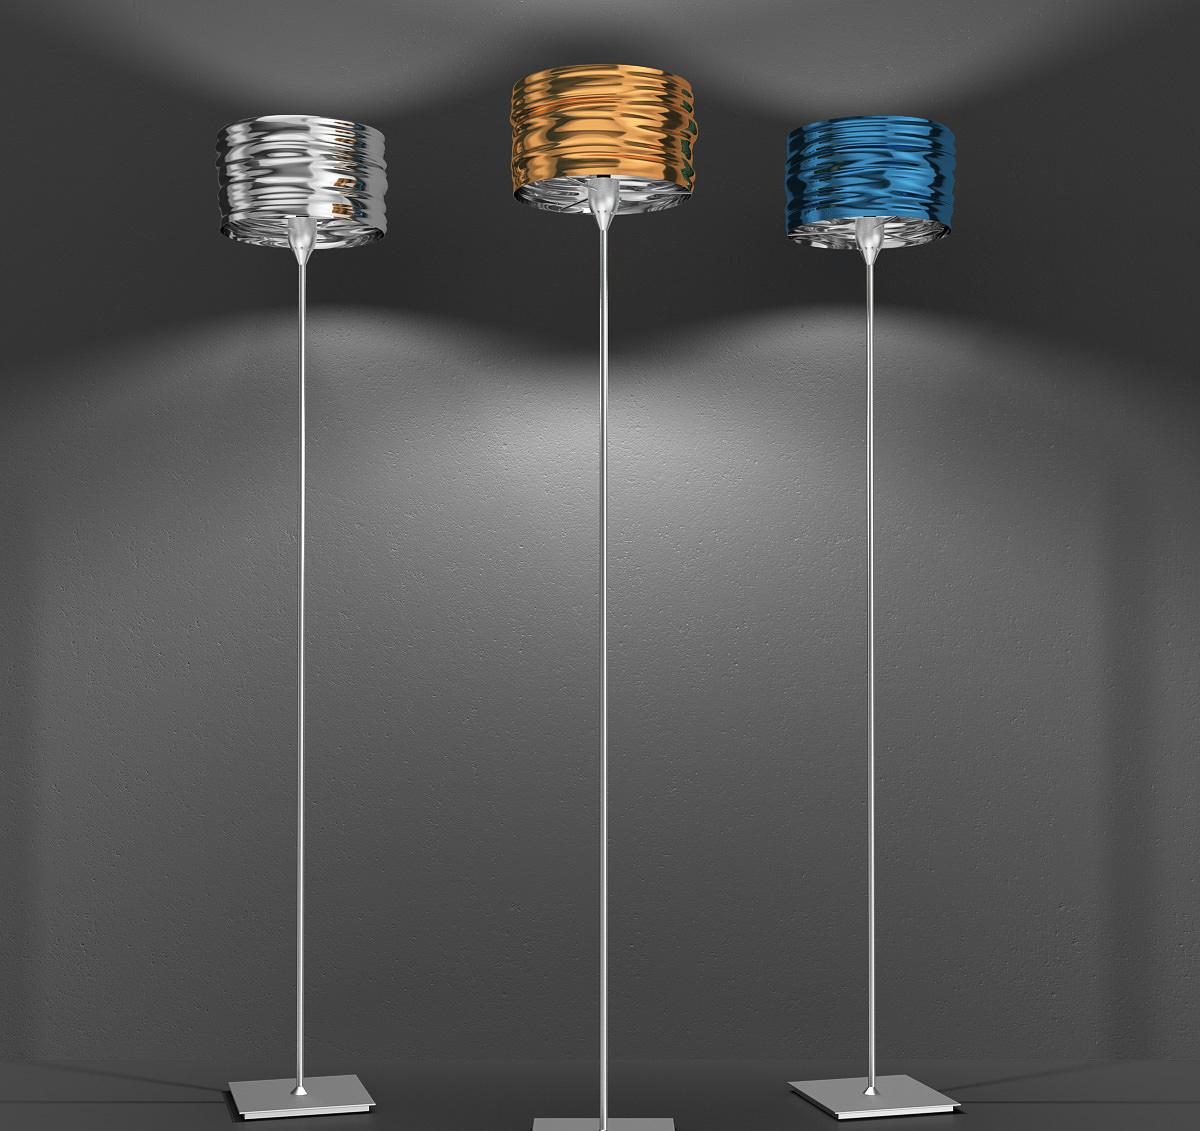 Artemide aqua cil solo estructura para l mpara 0926010a - Estructuras para lamparas ...